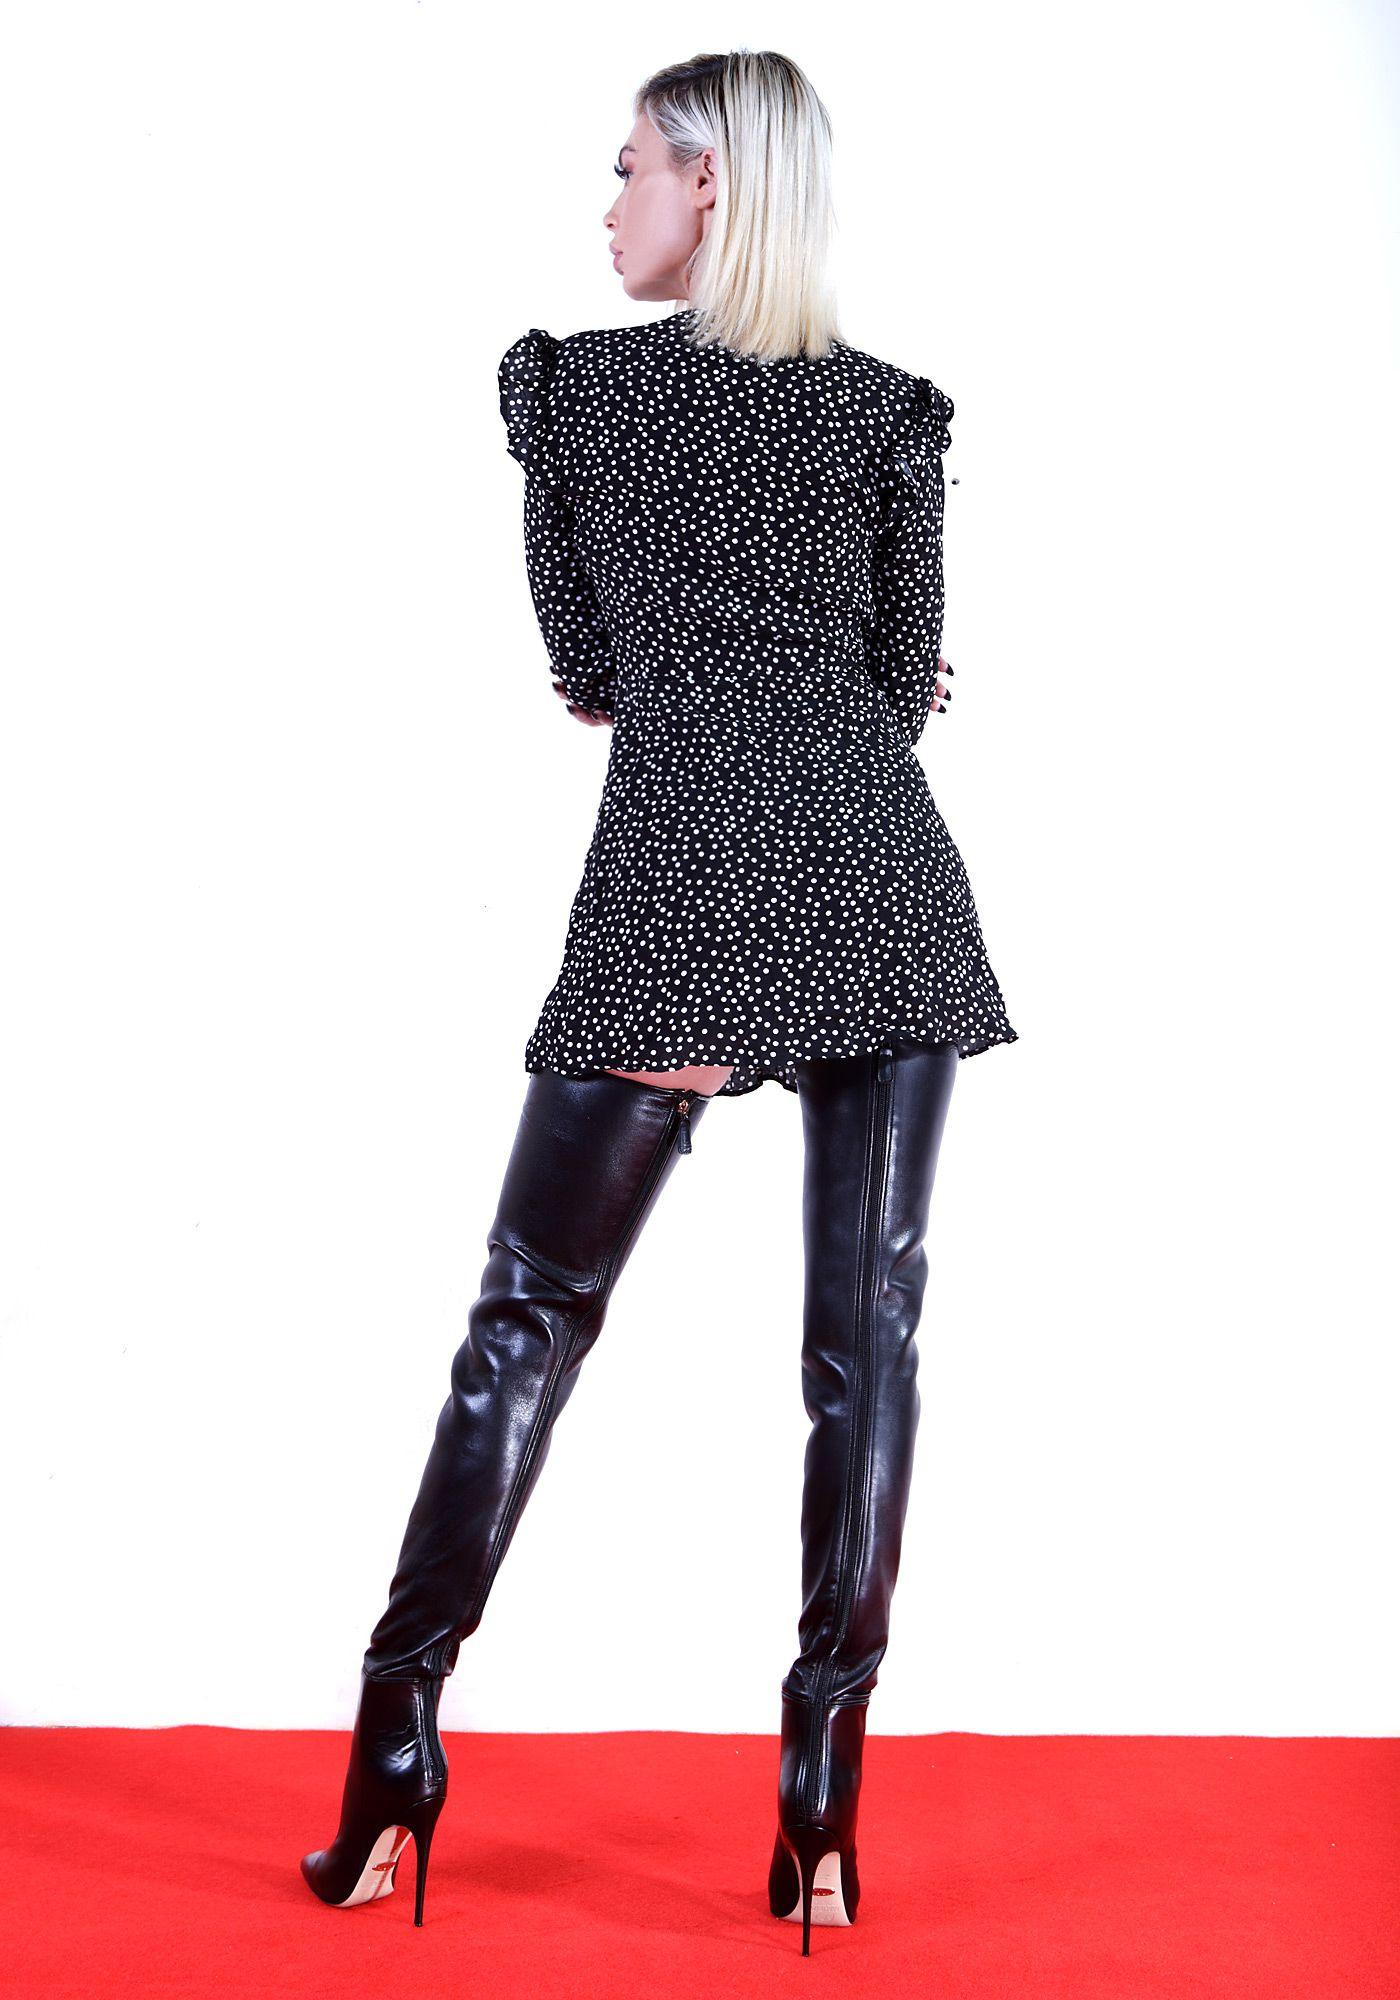 b14bdee9eee27 DIANA80 black in 2019 | Overknee Stiefel | Overknee stiefel ...